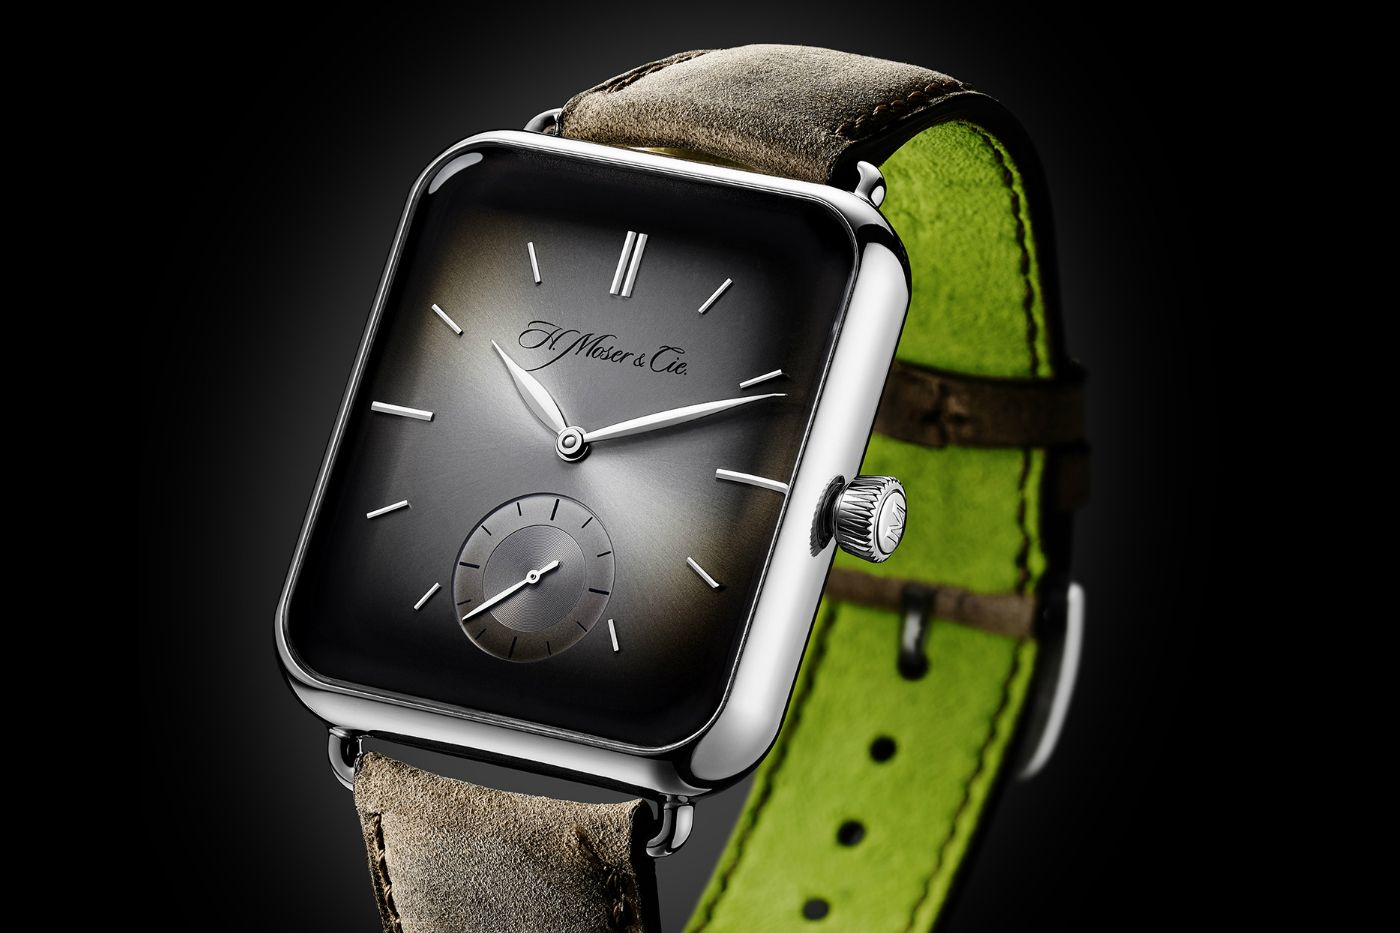 The Swiss Alp Watch is unashamedly an Apple Watch ripoff